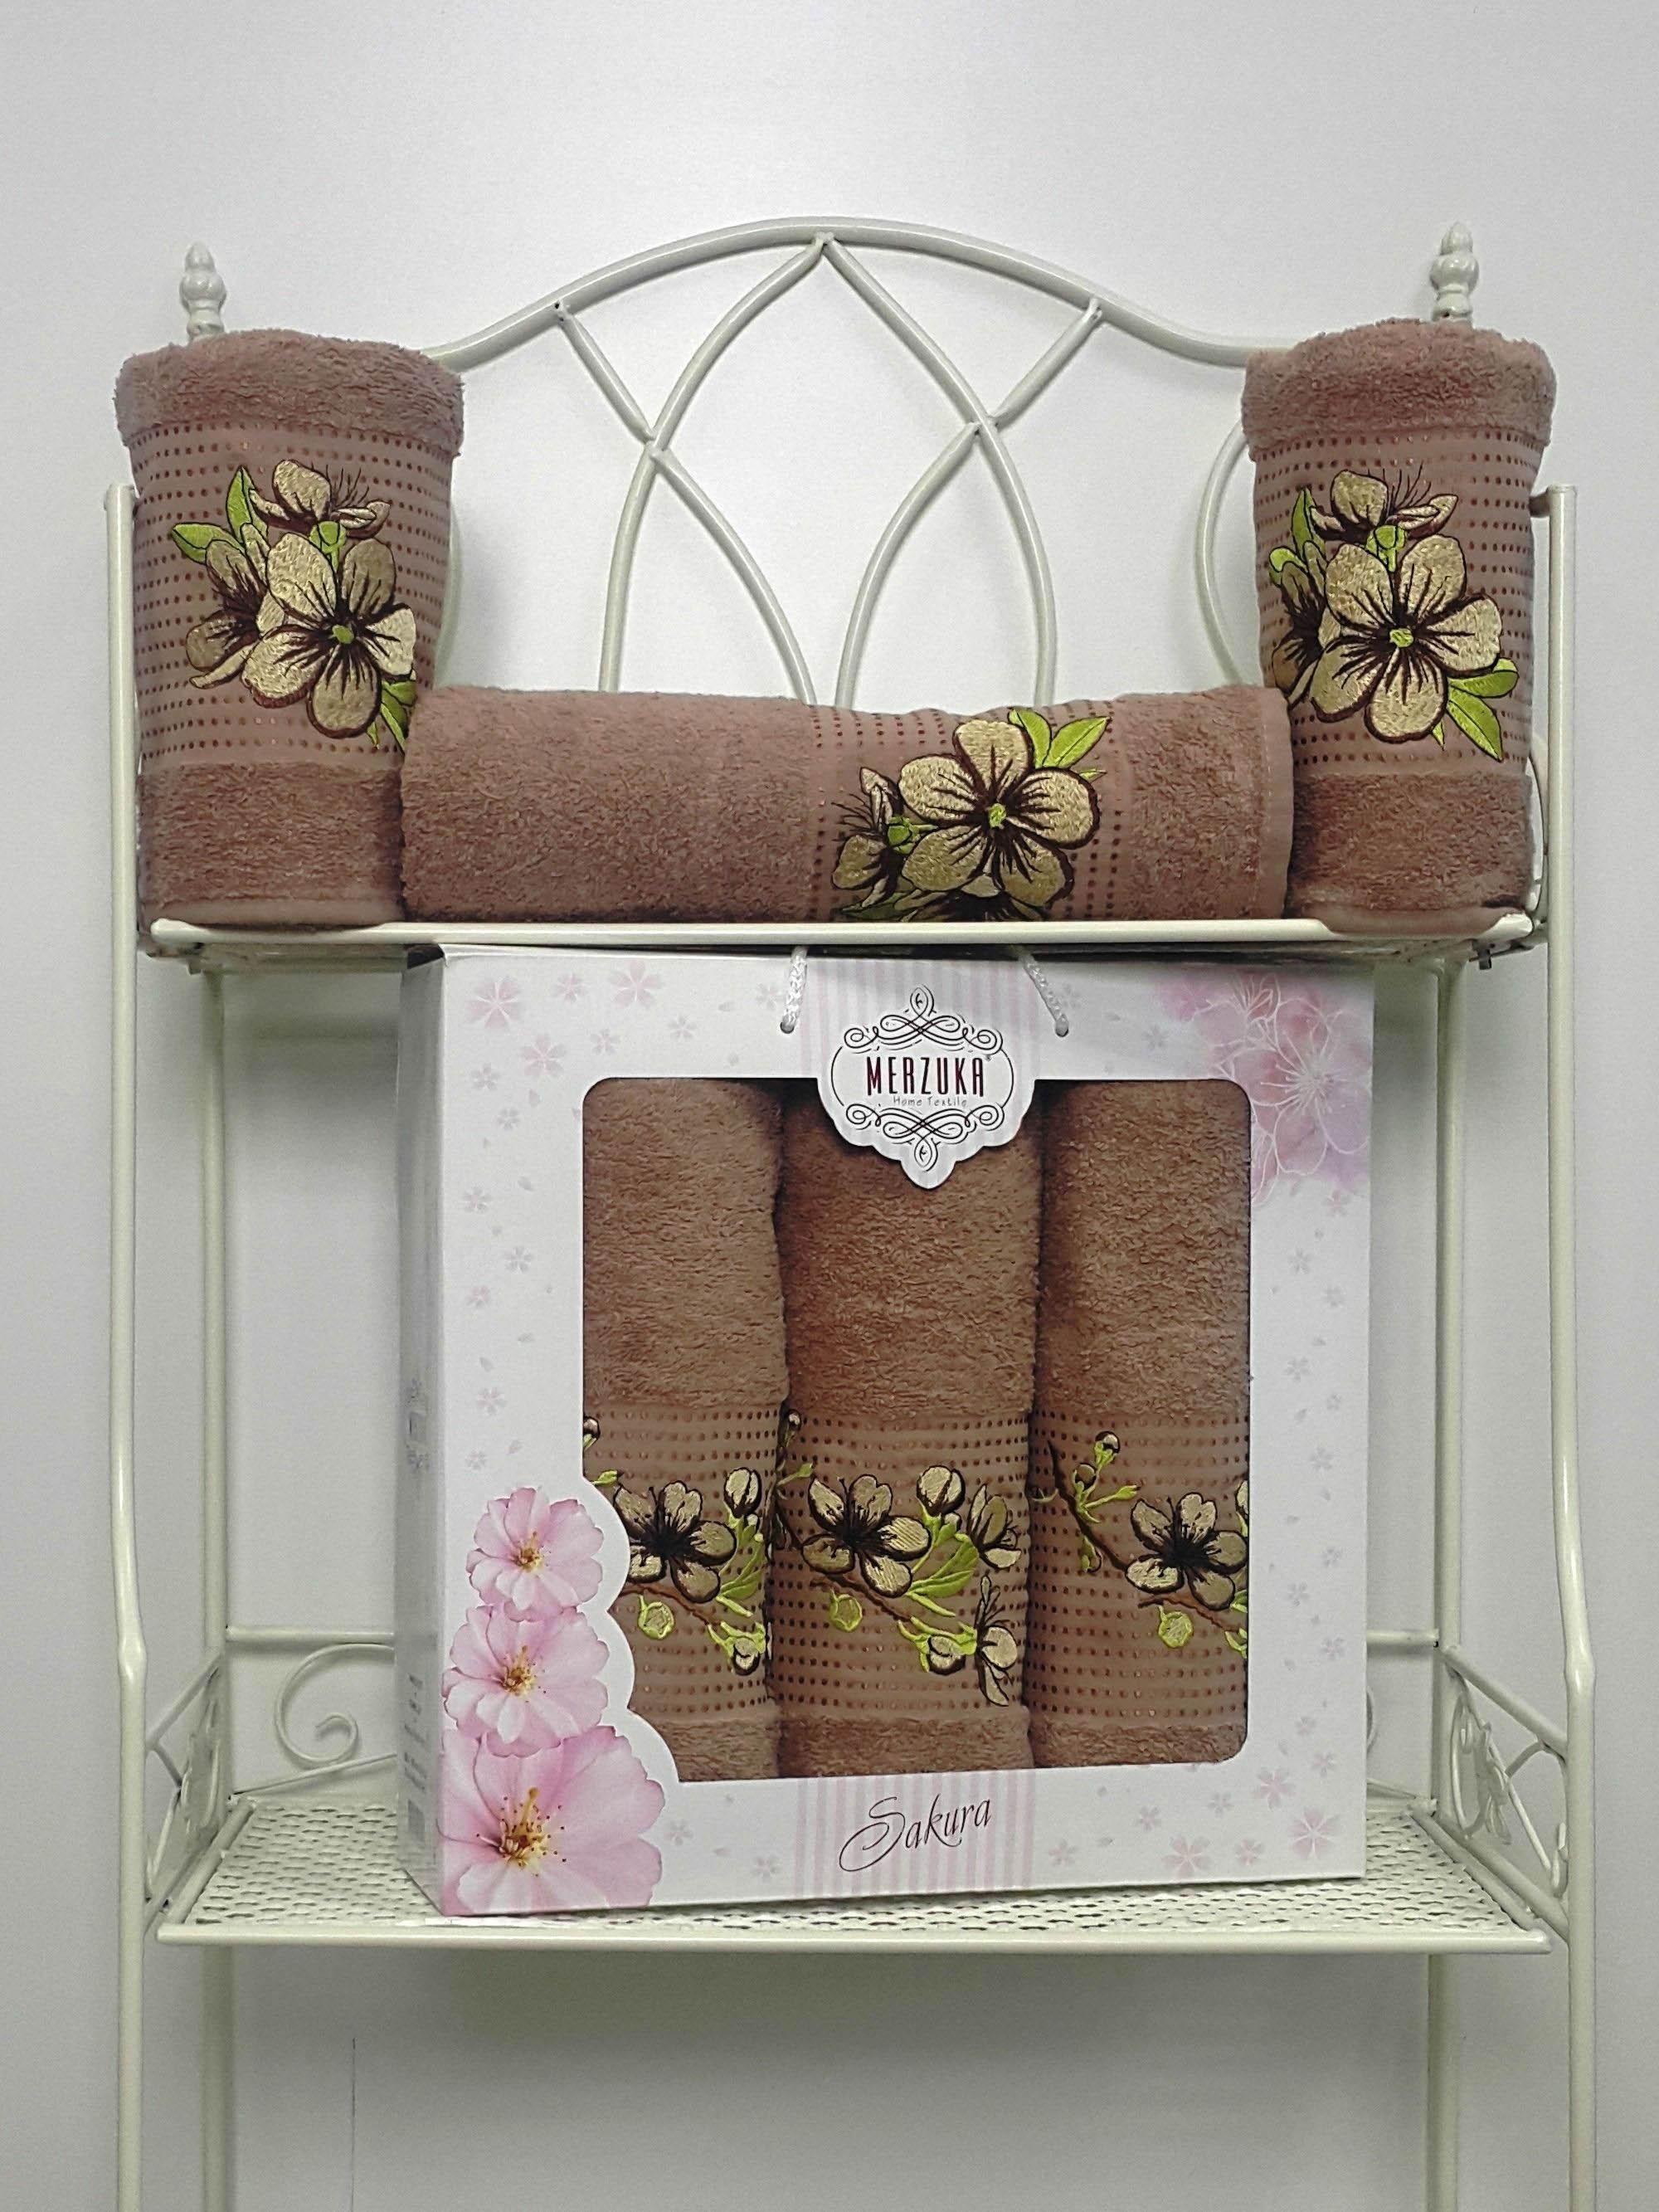 Полотенца Oran Merzuka Полотенце Sakura Цвет: Коричневый (Набор) набор из 3 полотенец merzuka sakura 50х90 2 70х140 8432 розовый